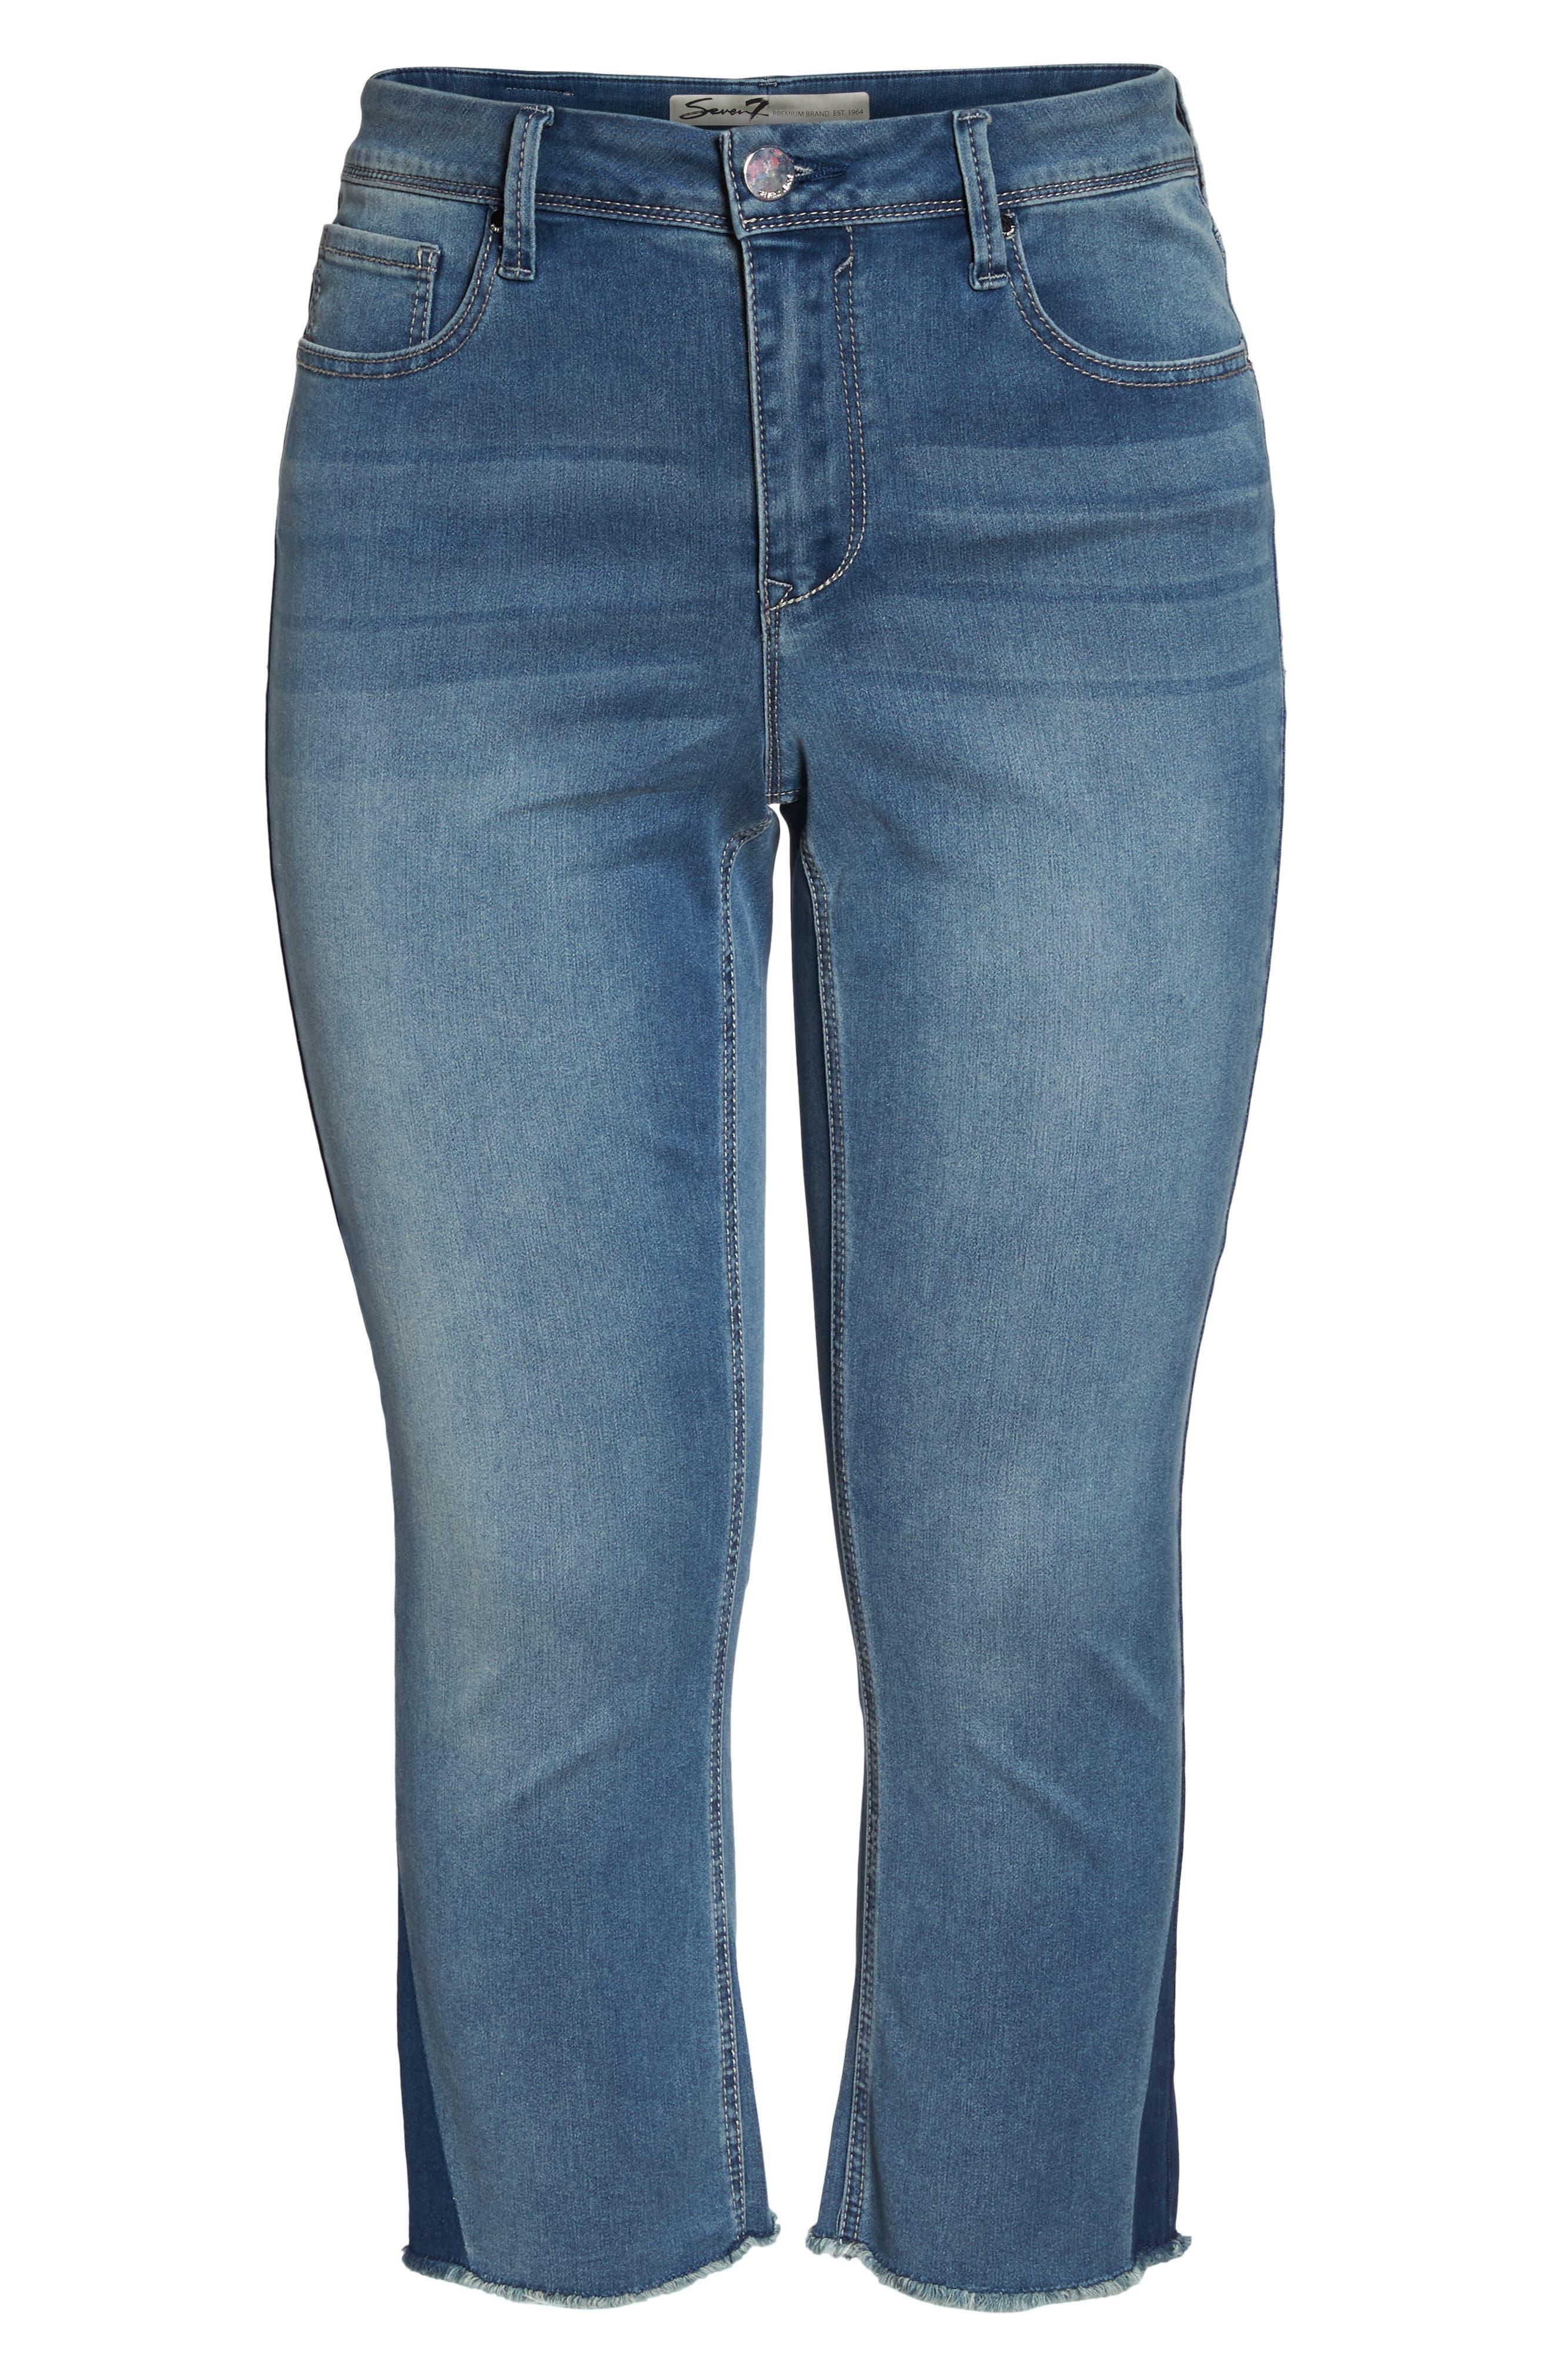 Shadow Godet Ankle Duster Jeans,                             Alternate thumbnail 7, color,                             LEVINE